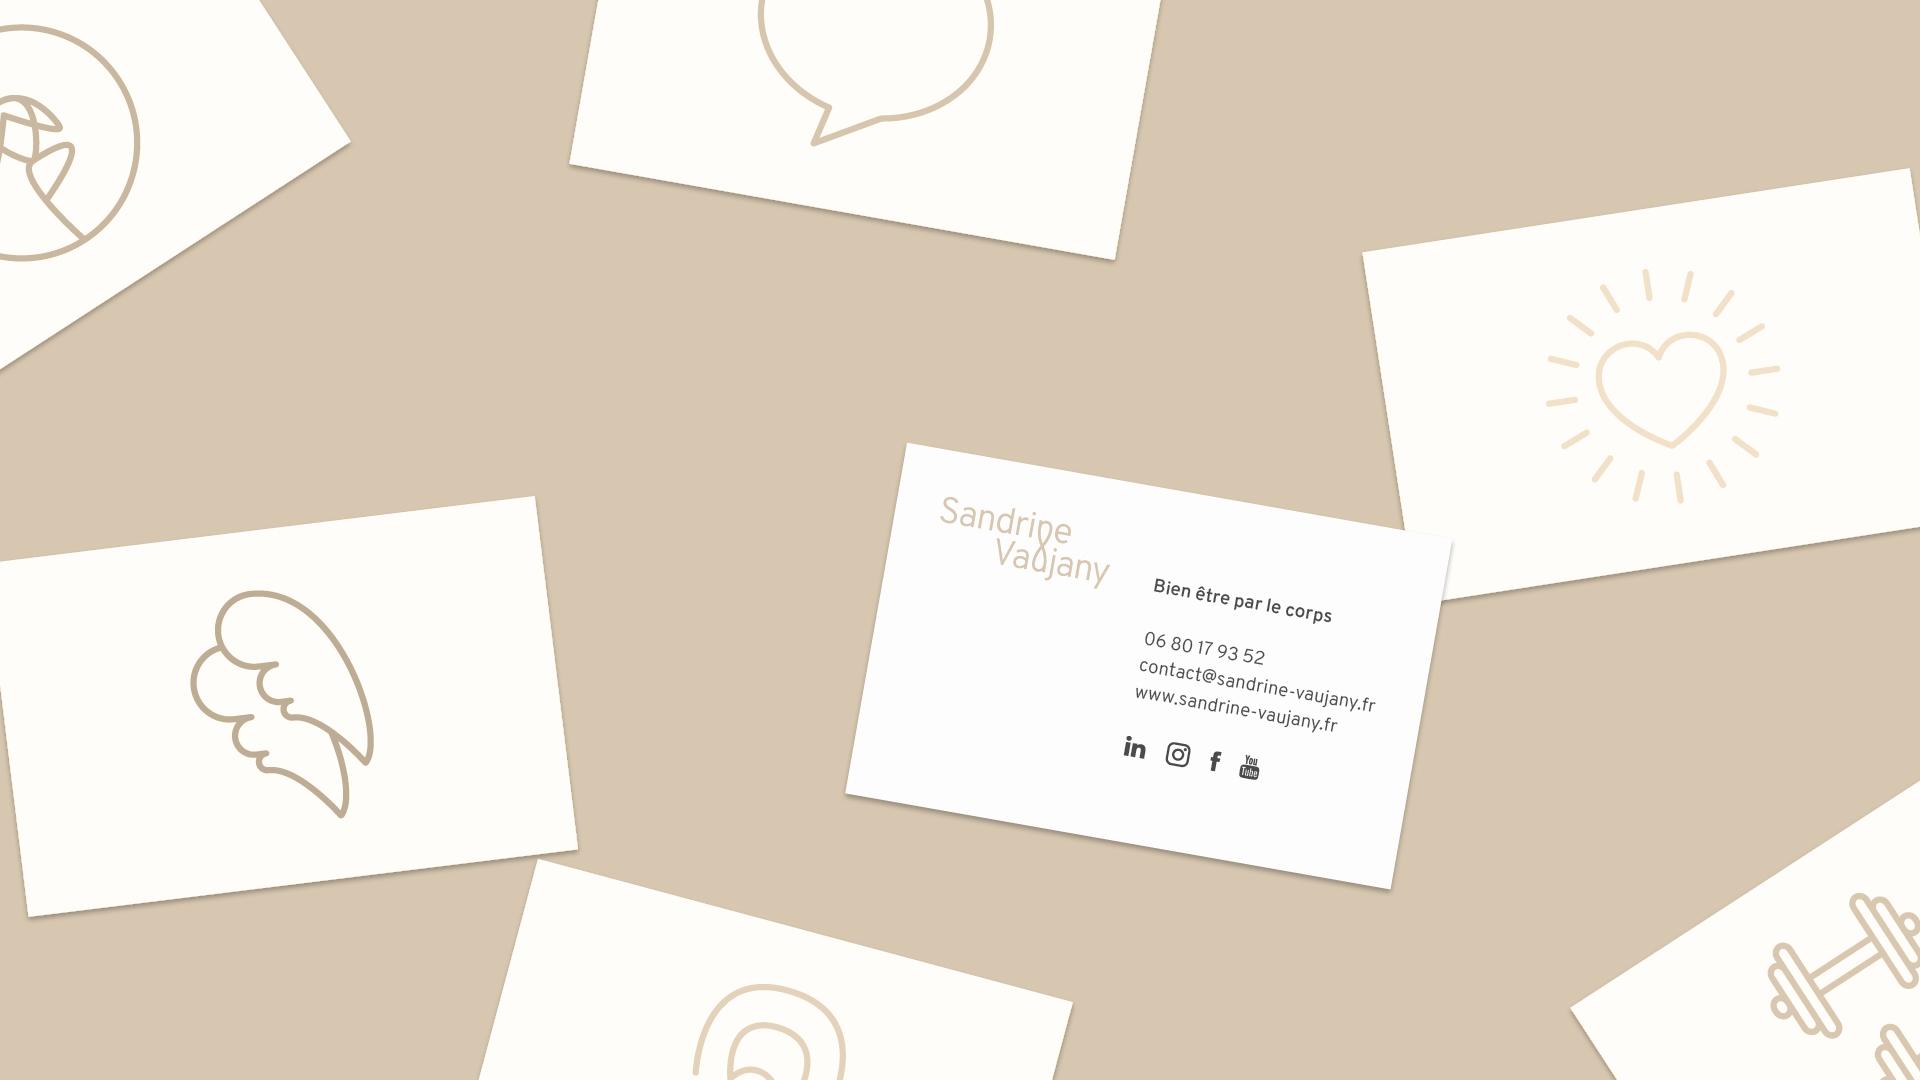 Cartes de visite de Sandrine Vaujany